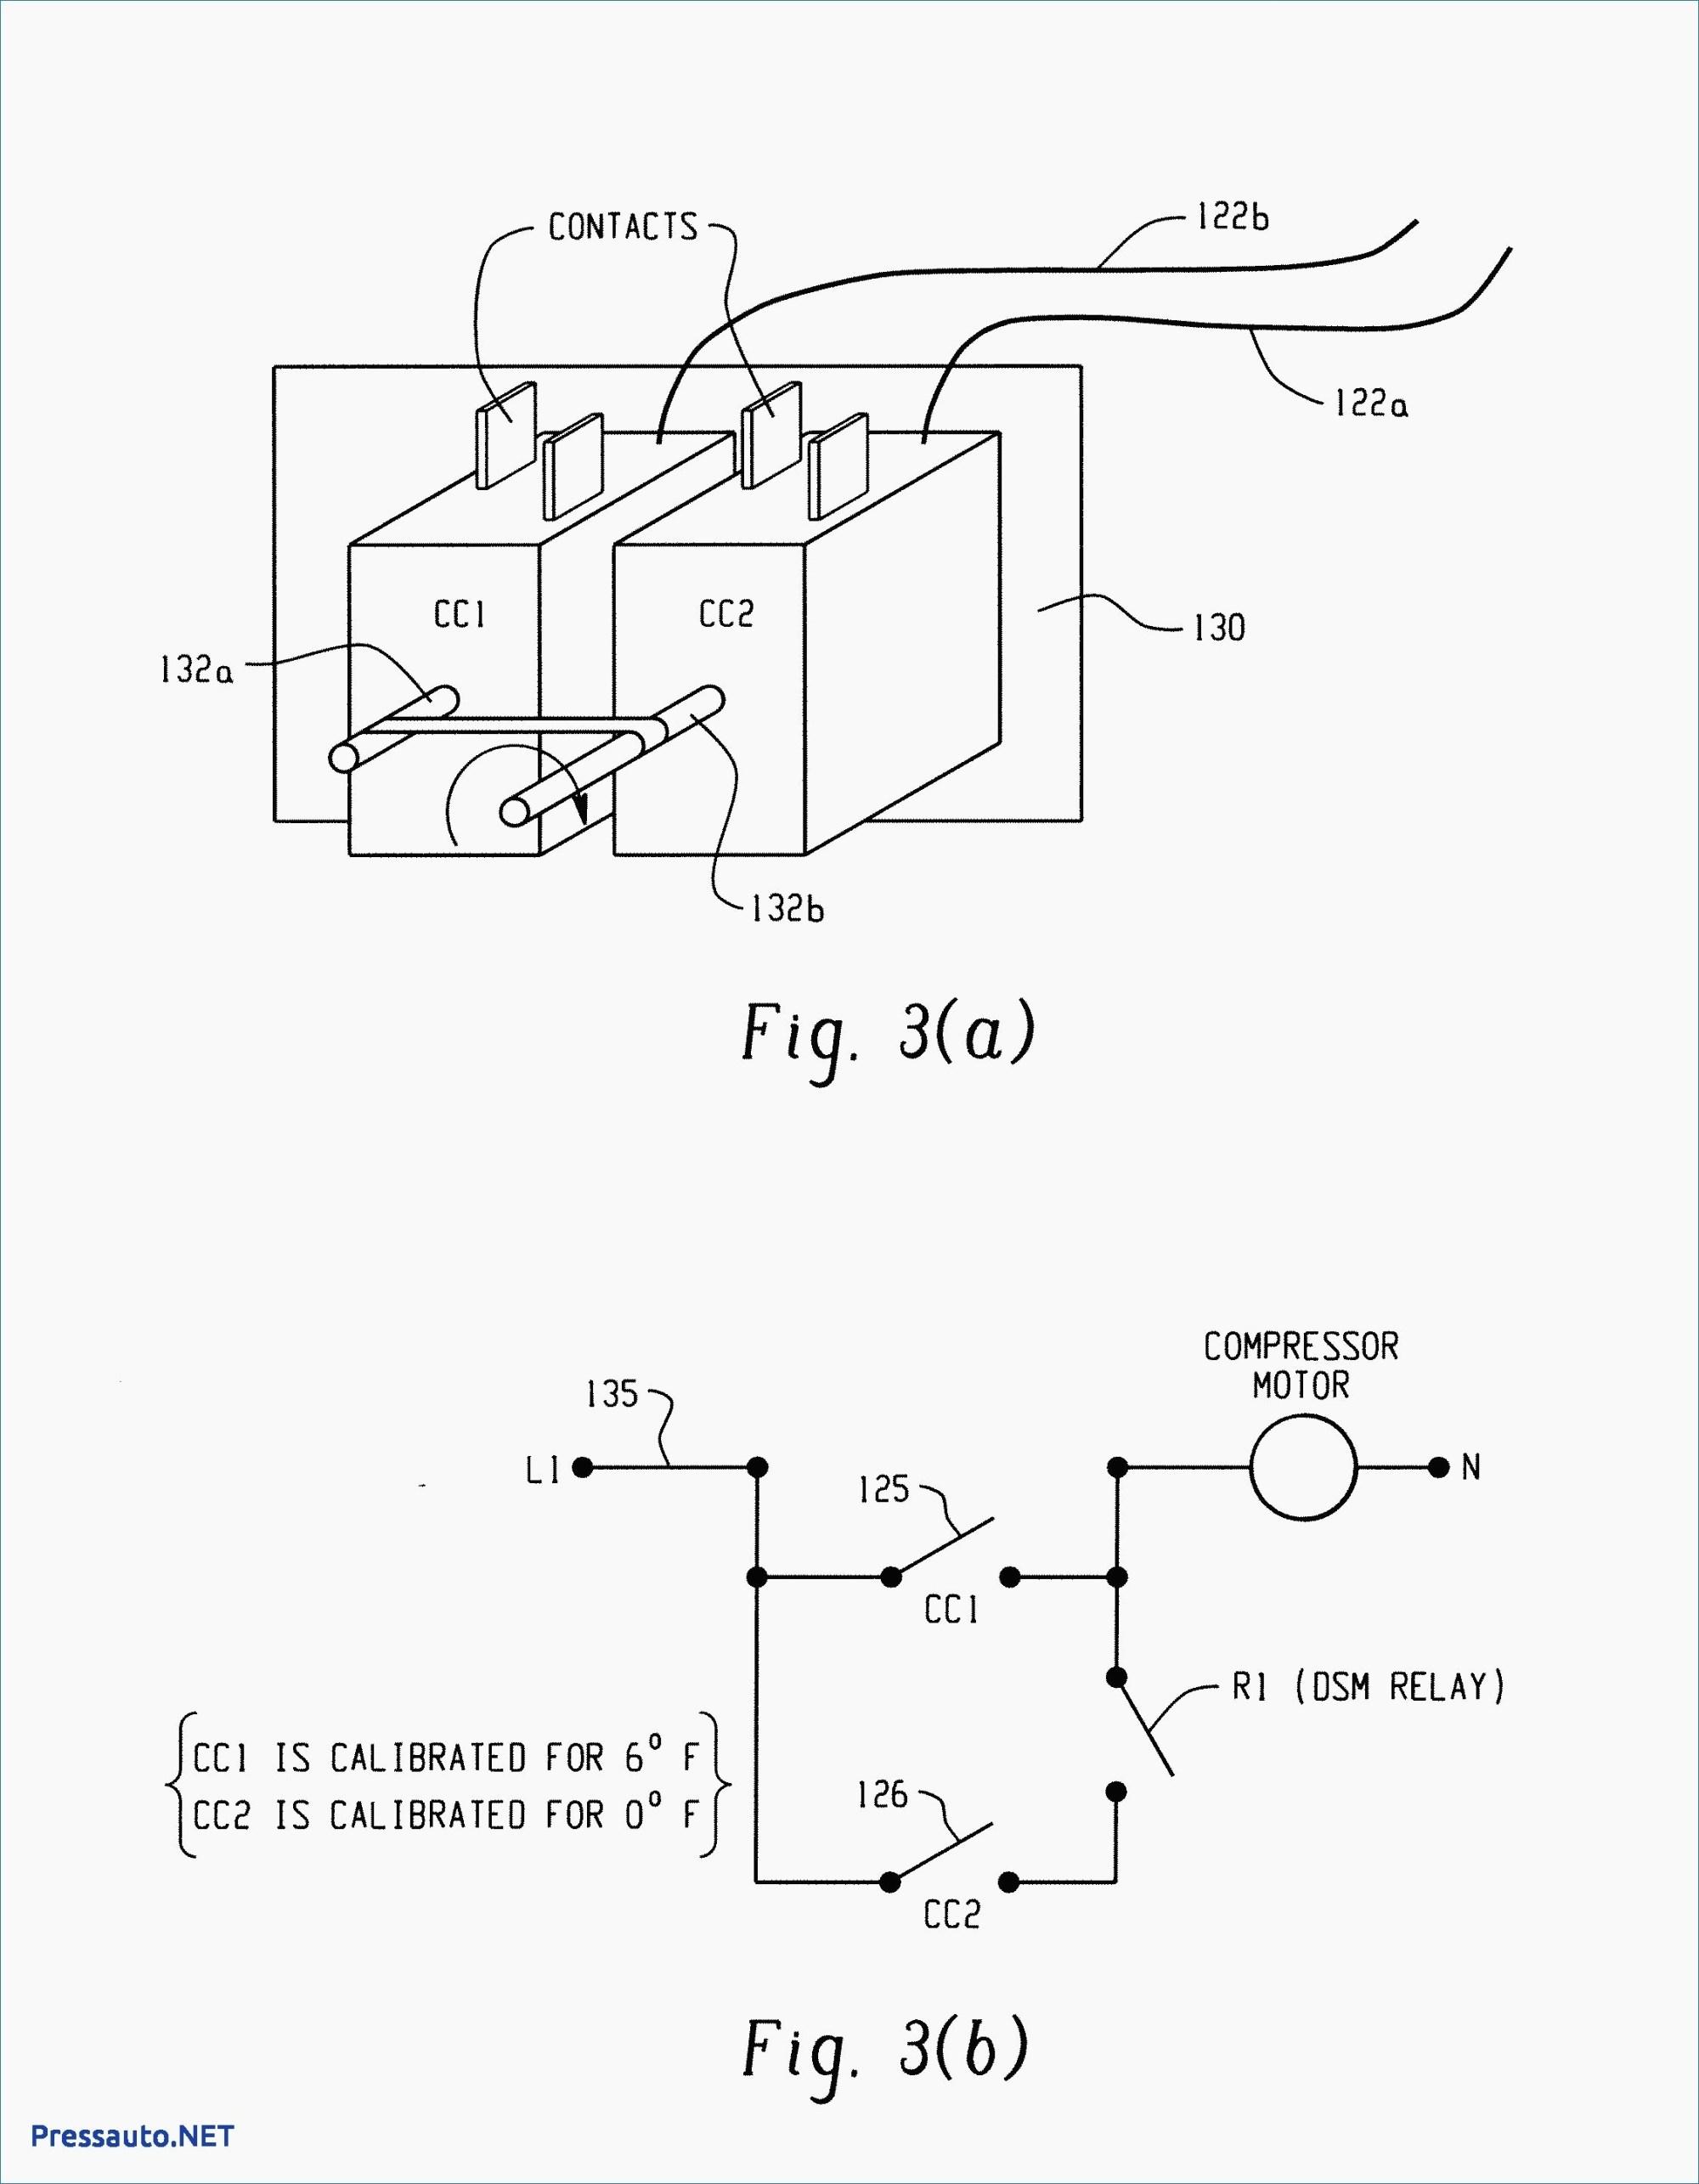 hight resolution of 2 wire pressure transducer wiring diagram 3 wire pressure transducer wiring diagram luxury series 2